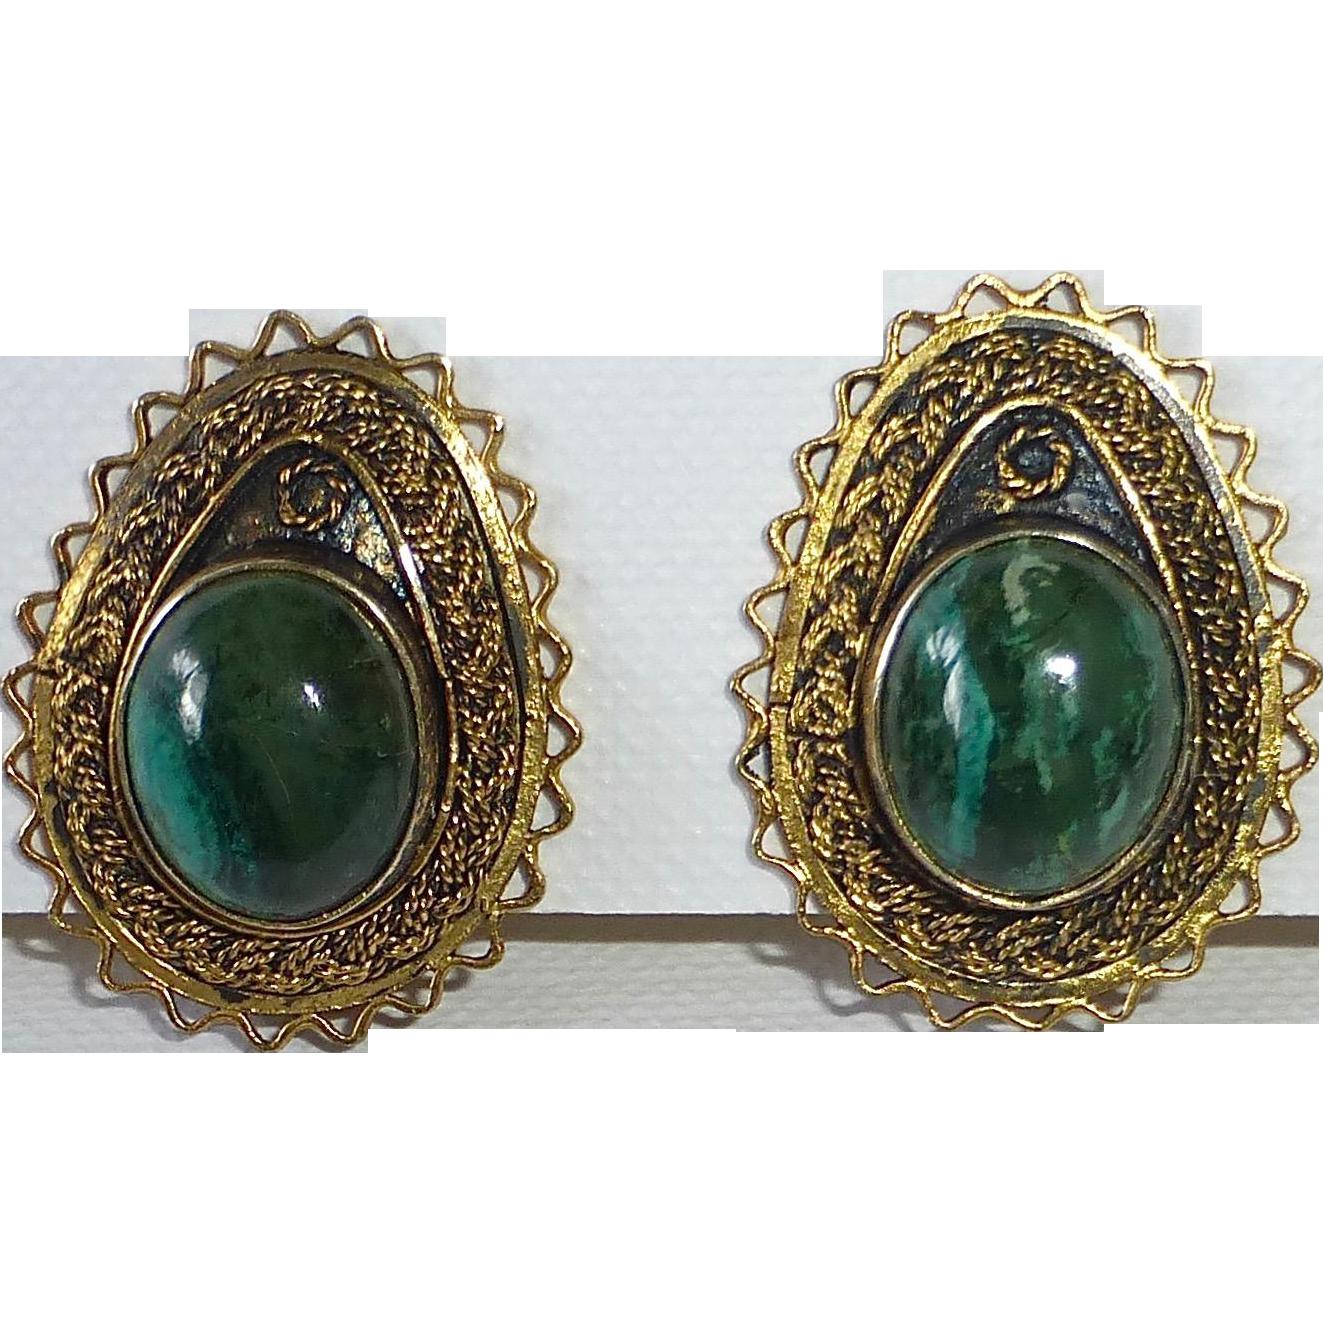 Gold Washed Sterling Israeli Filigree Clip Earrings w Eilat Stone